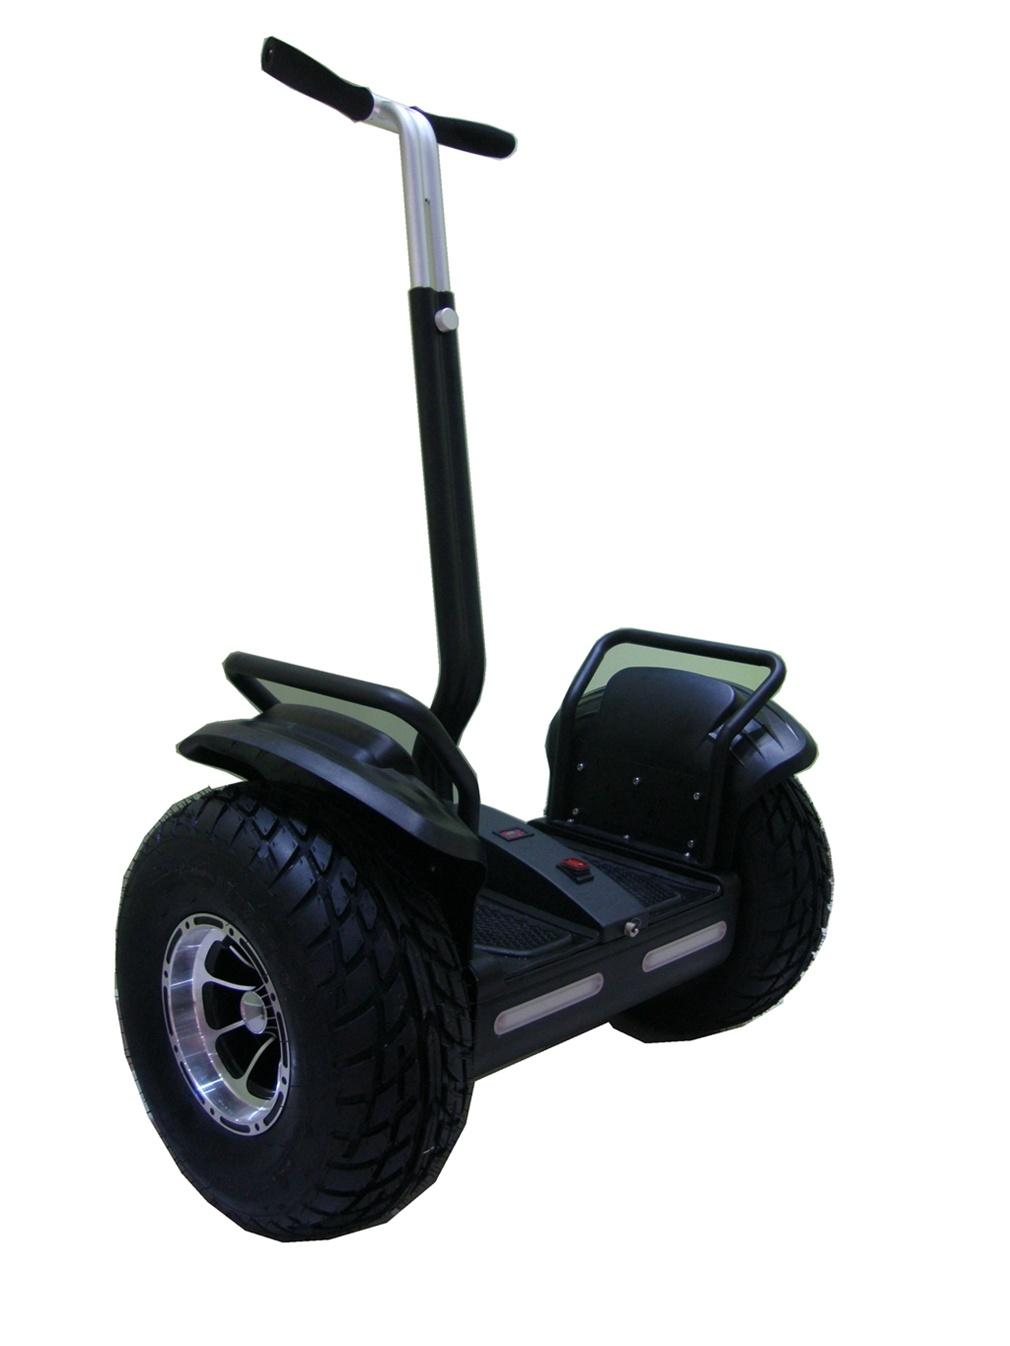 atv dirt bike scooter moped safer wholesale